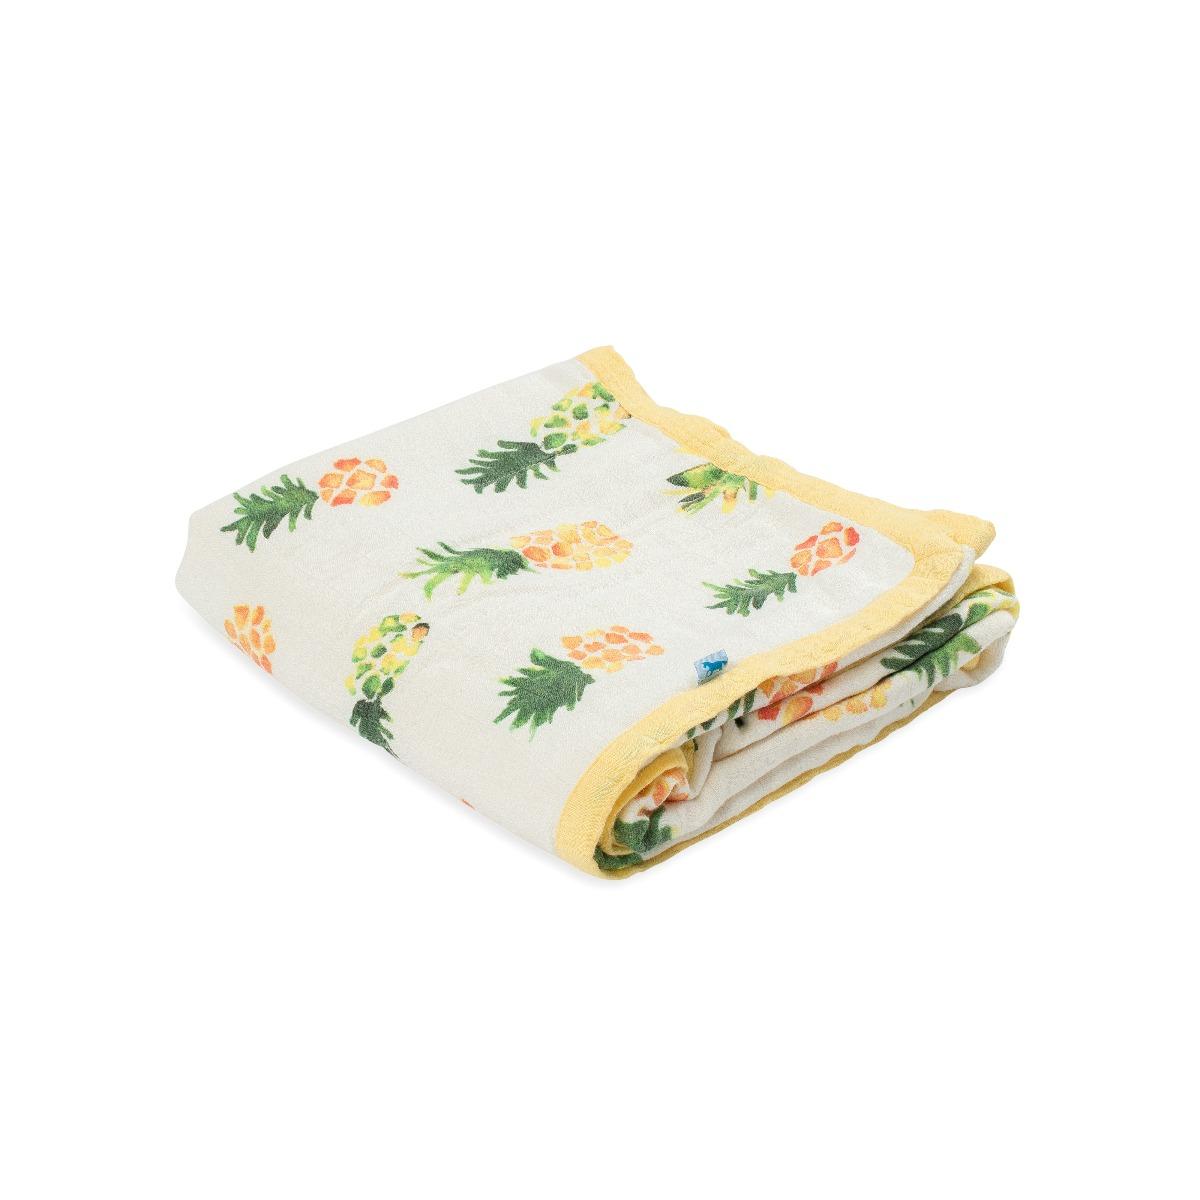 Little Unicorn Deluxe Muslin Quilt Pineapple